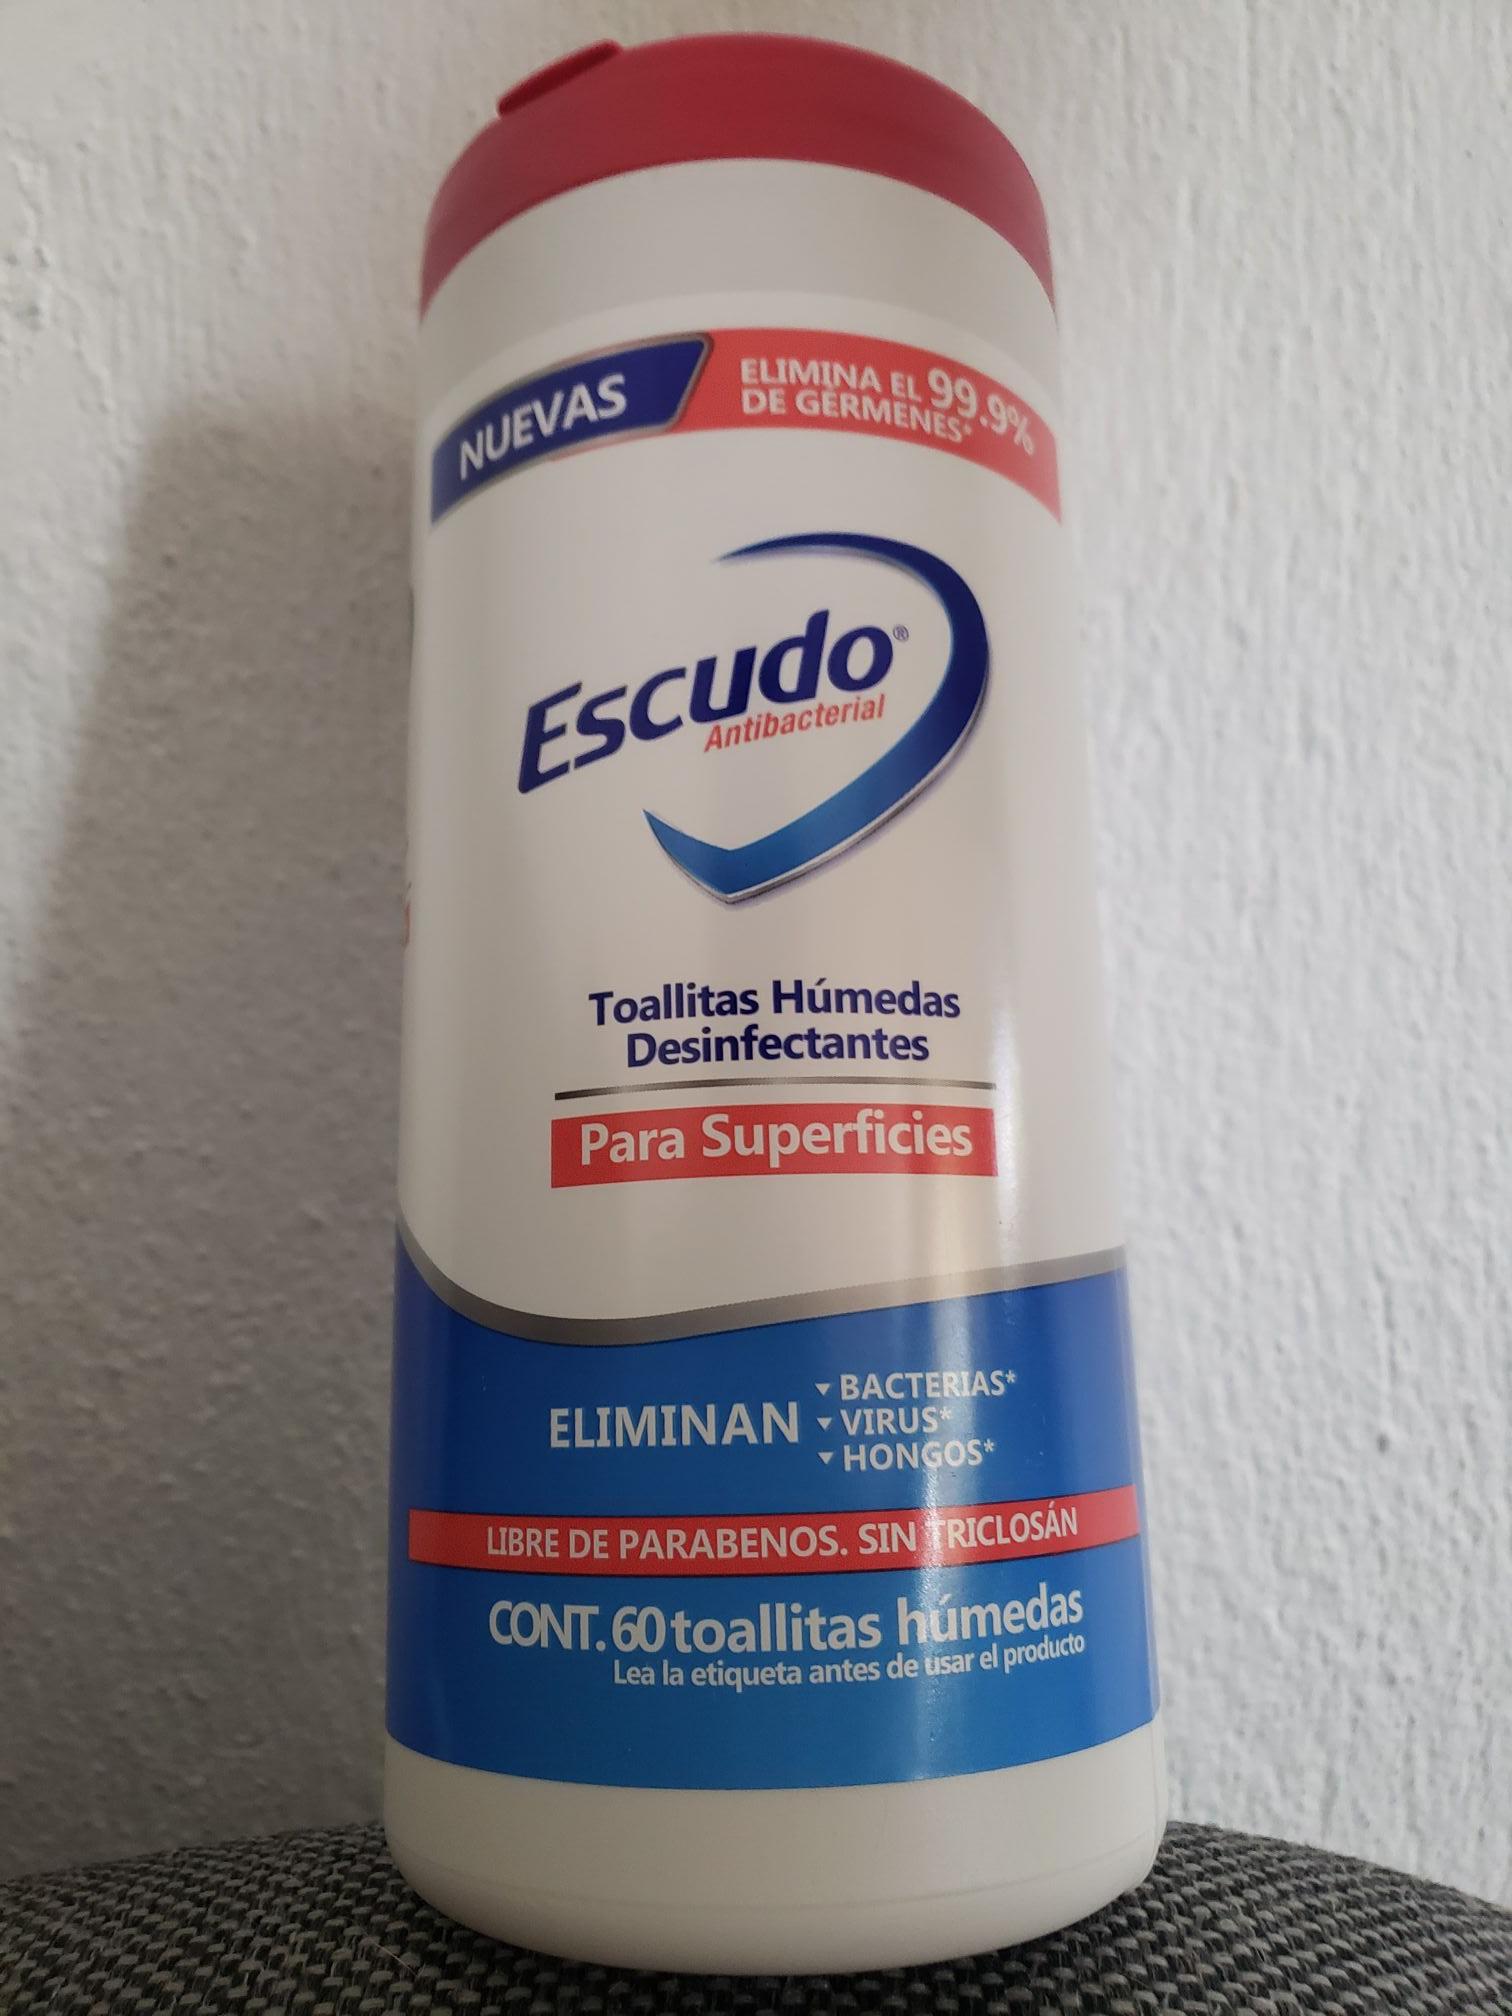 Farmacias Guadalajara 60 toallitas húmedas Escudo Antibacterial